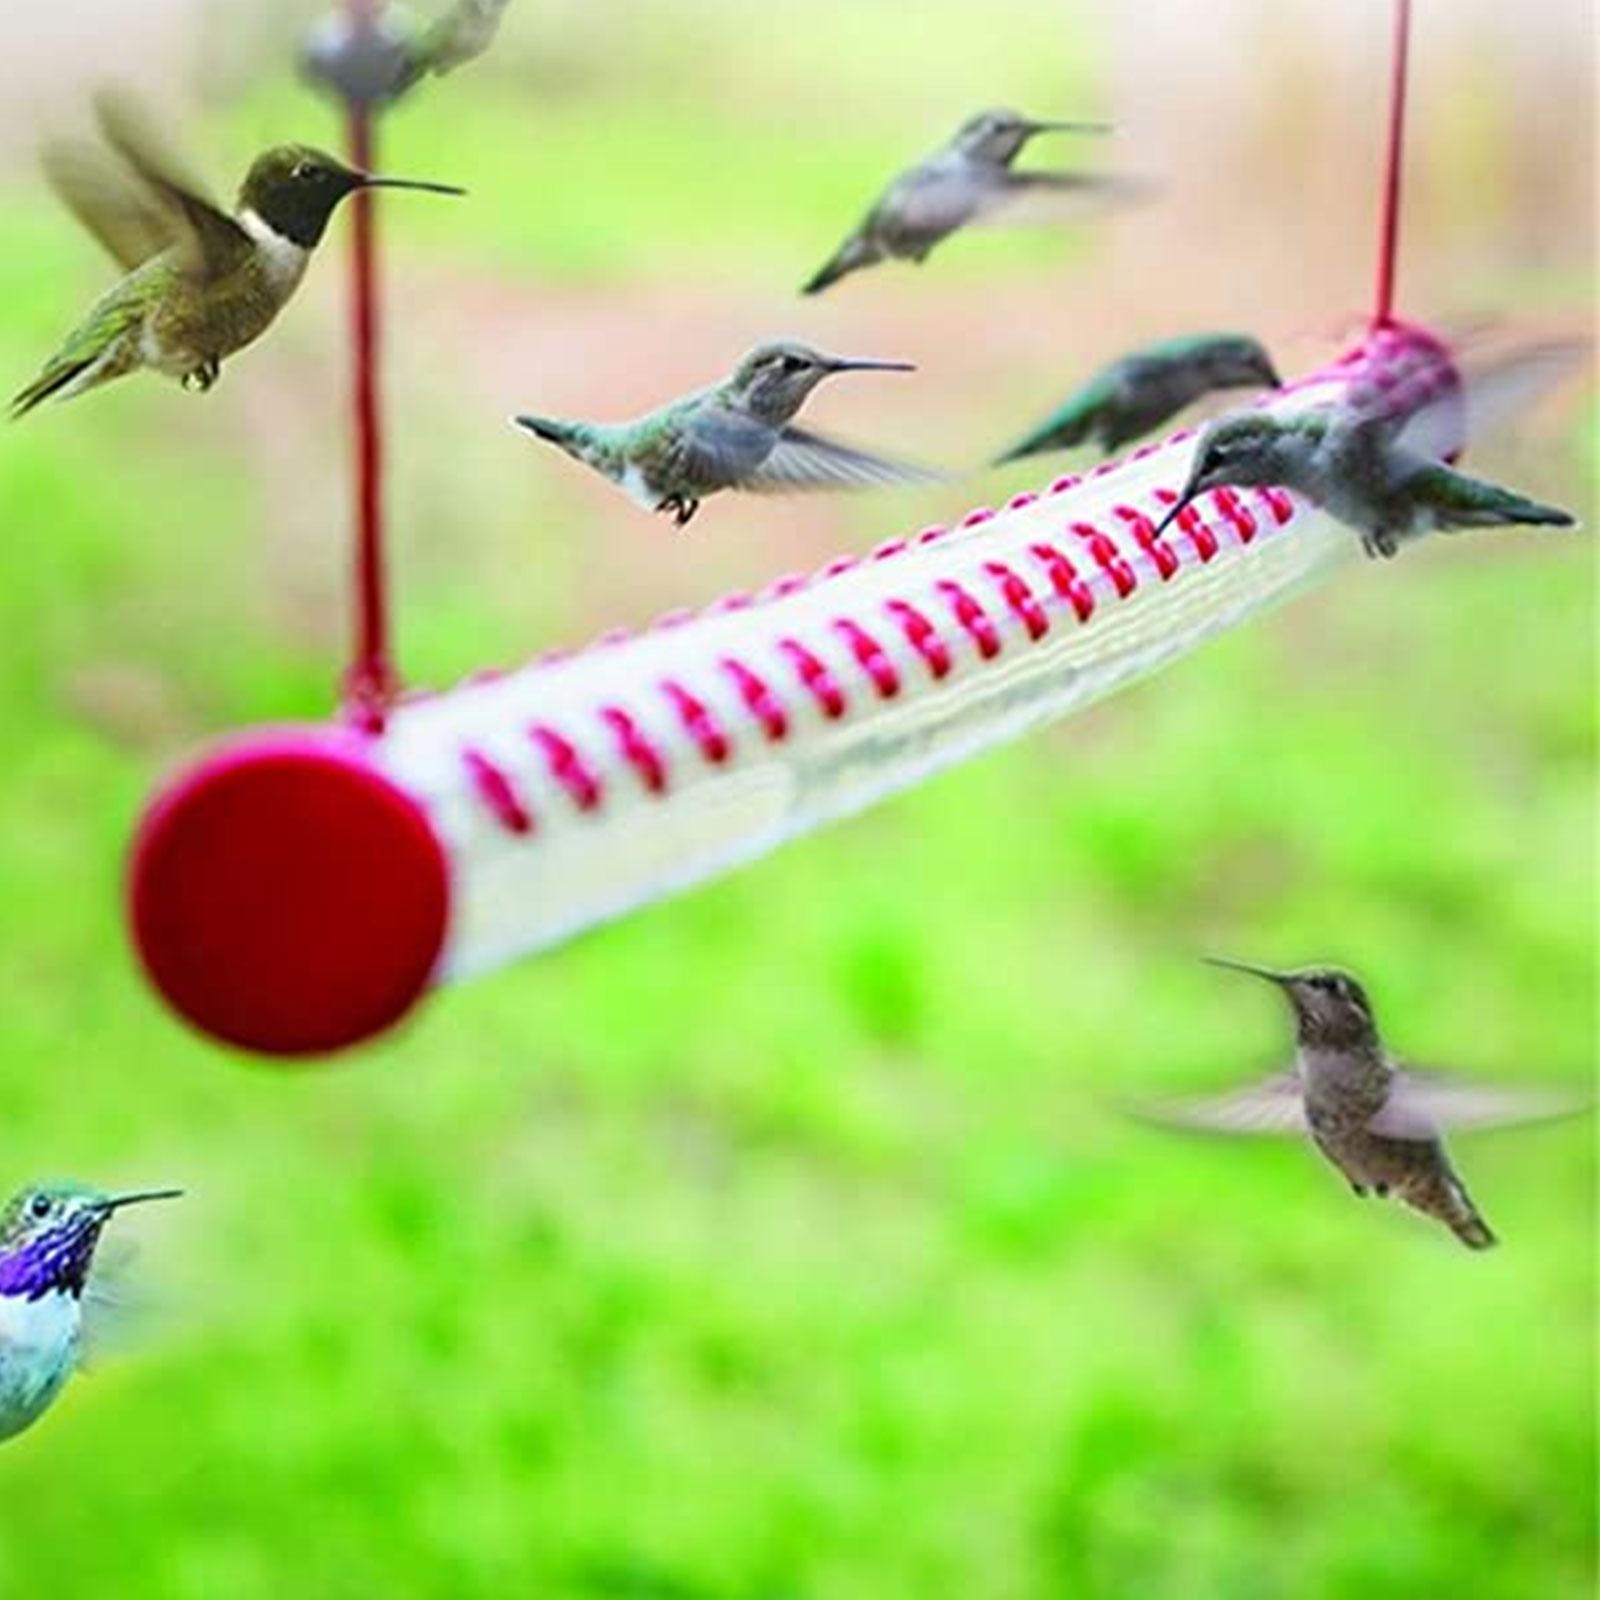 Hummingbird Feeder With Hole Birds Feeding Transparent Pipe Easy To Use Household Garden Feeding Supplies